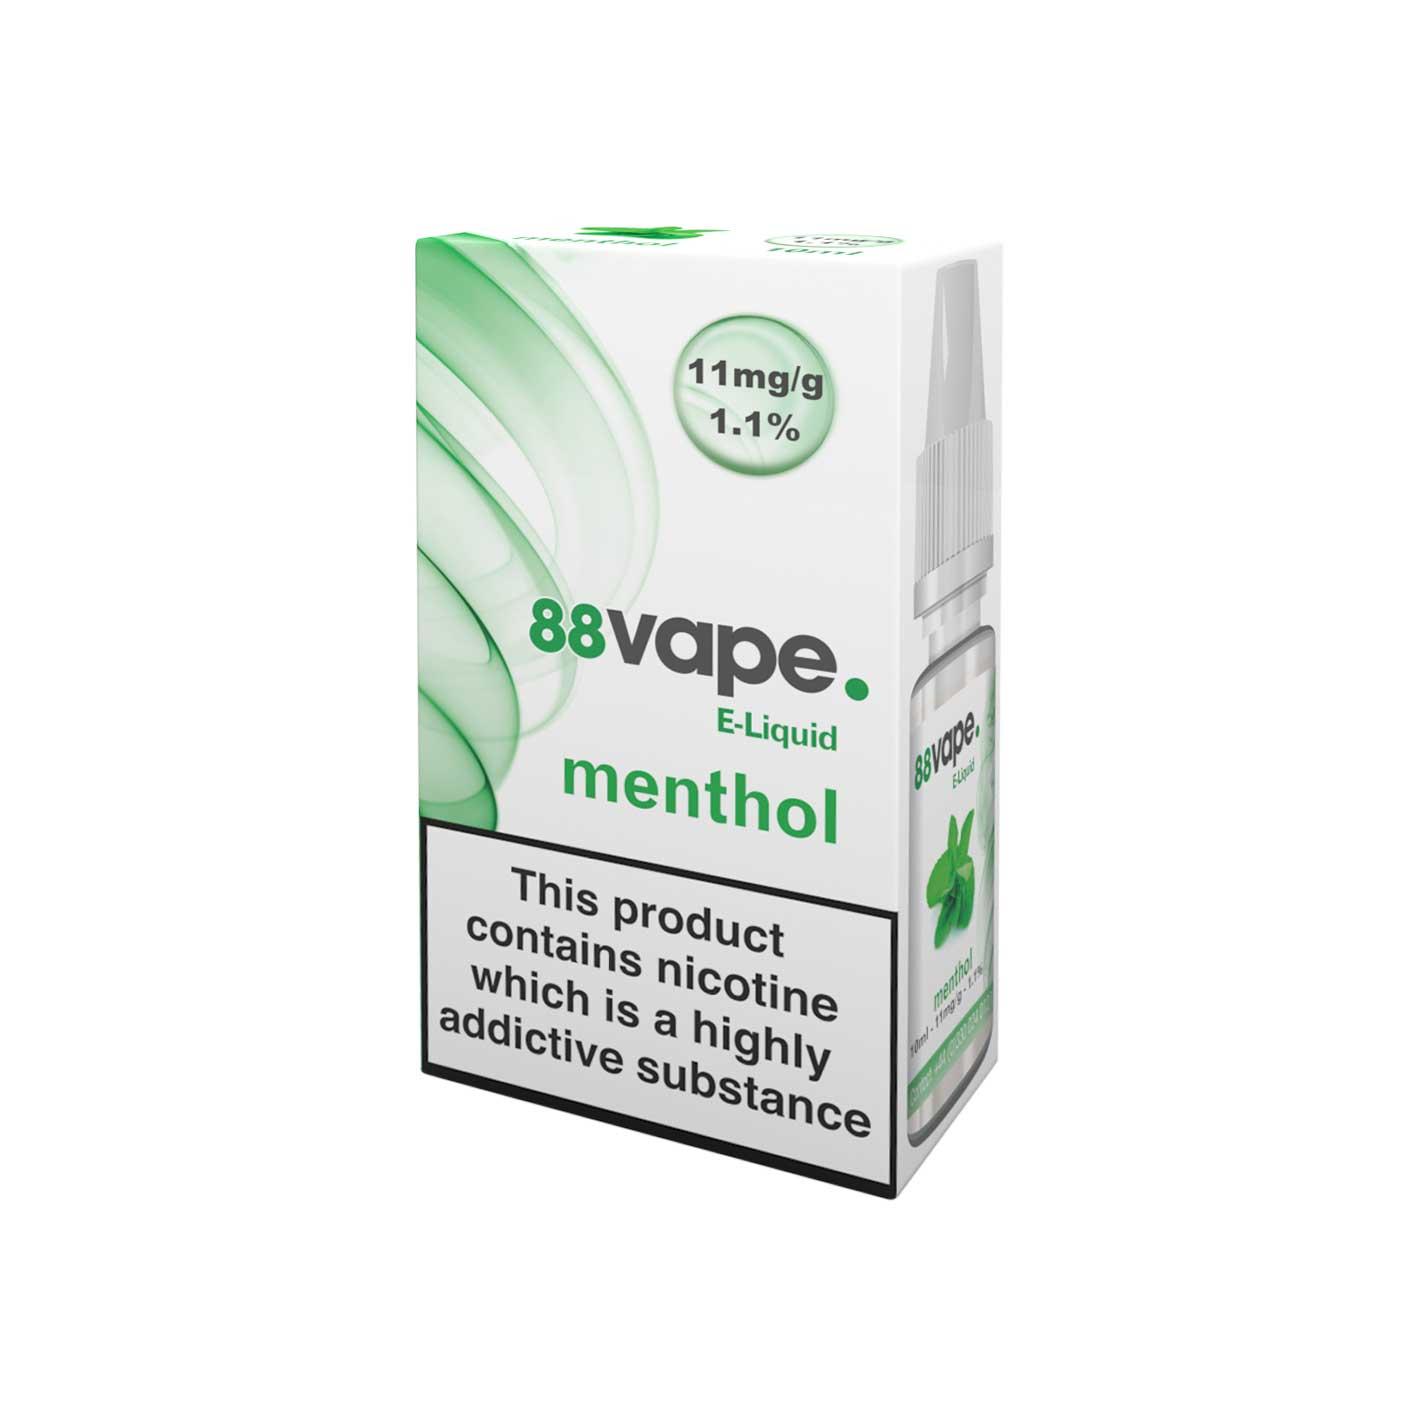 88Vape E-Liquid Menthol 10ml - 11mg Nicotine - Extra Value 20 Pack lowest price